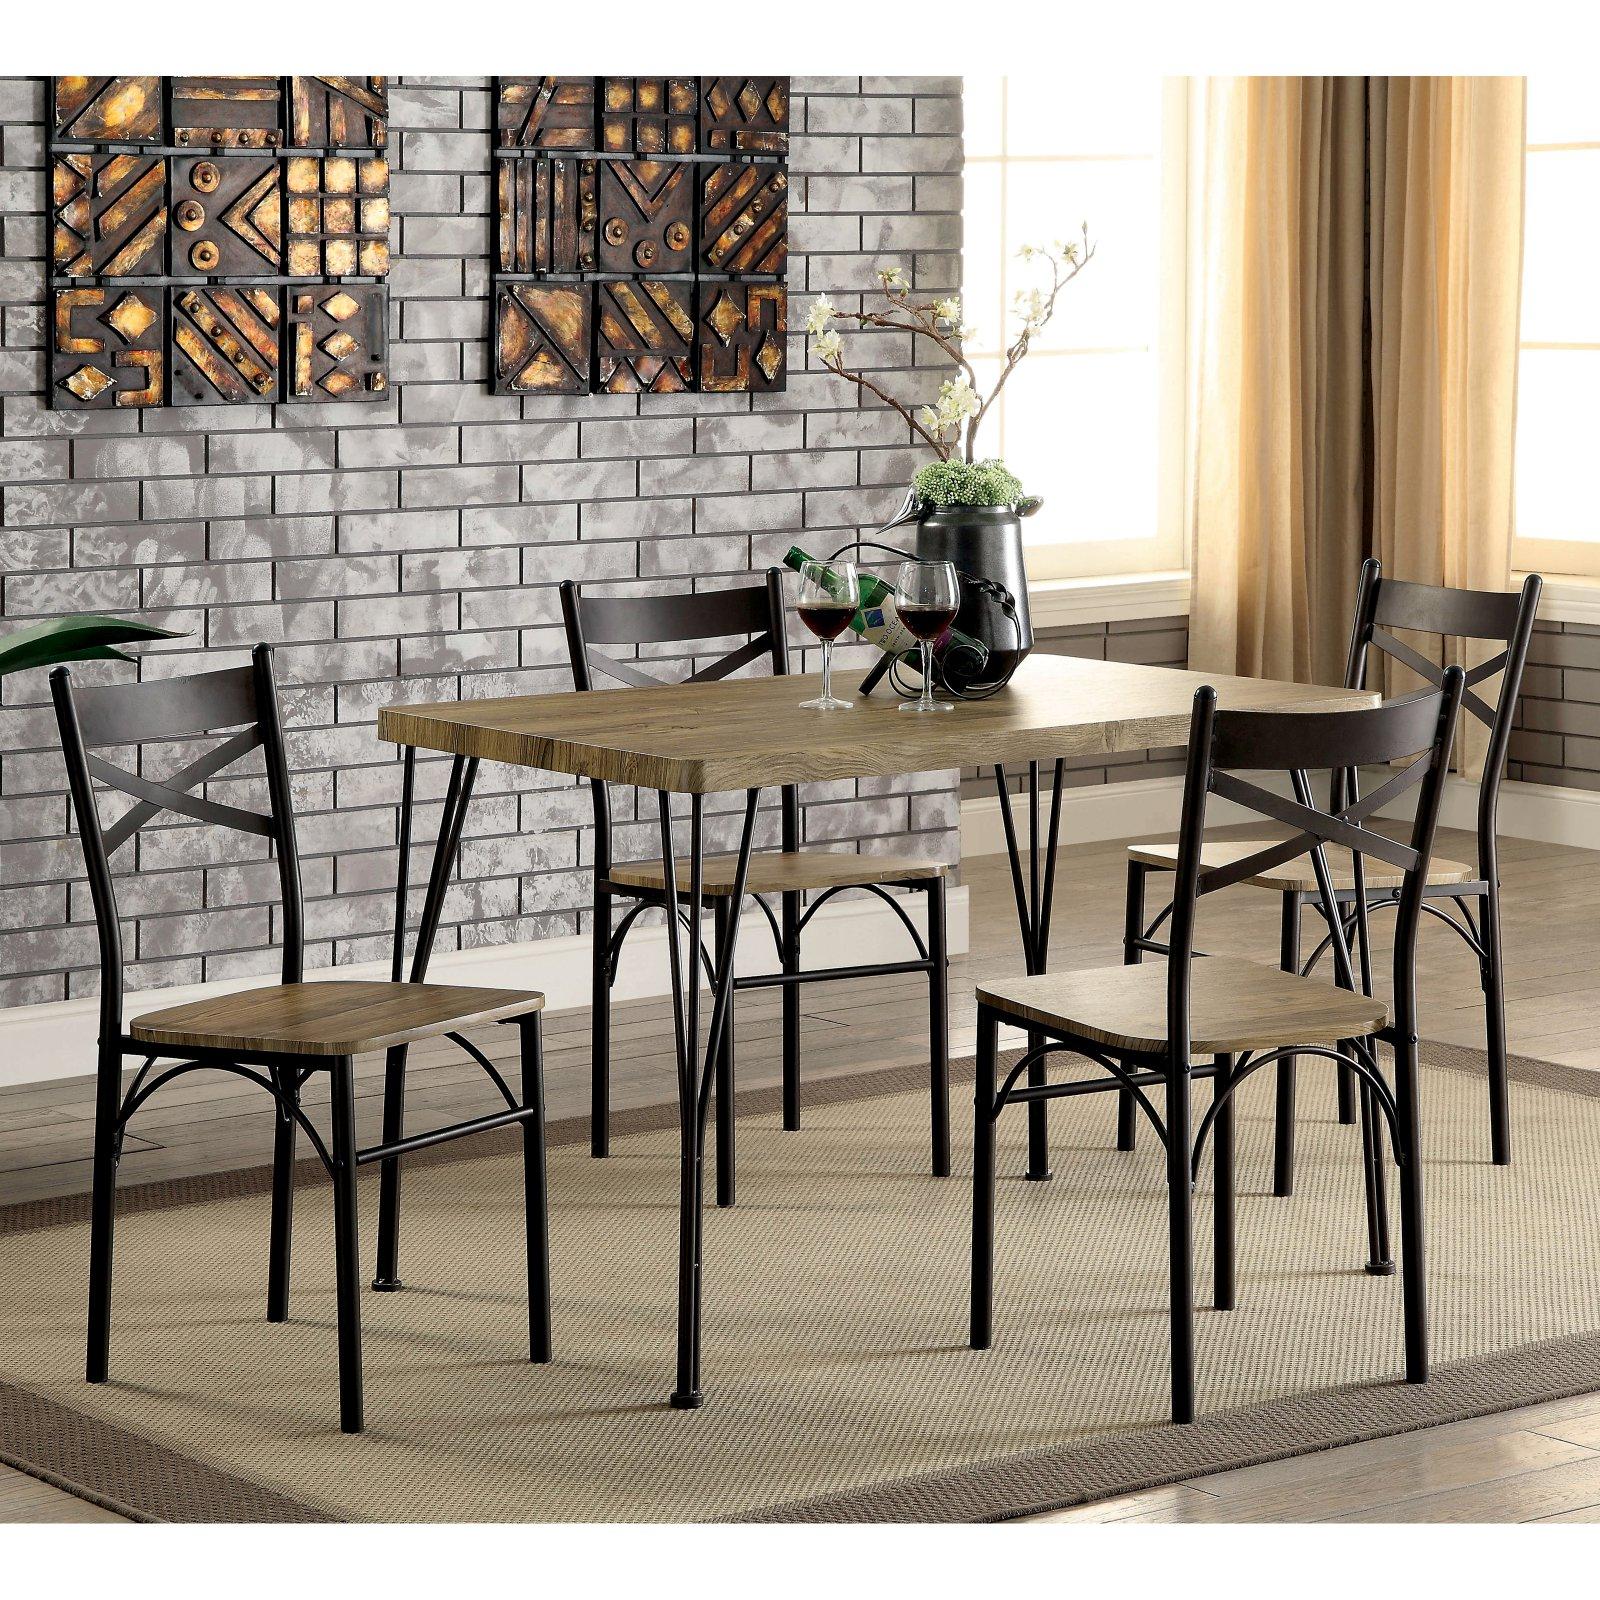 Furniture of America Amonica 5 Piece Casual Dining Set